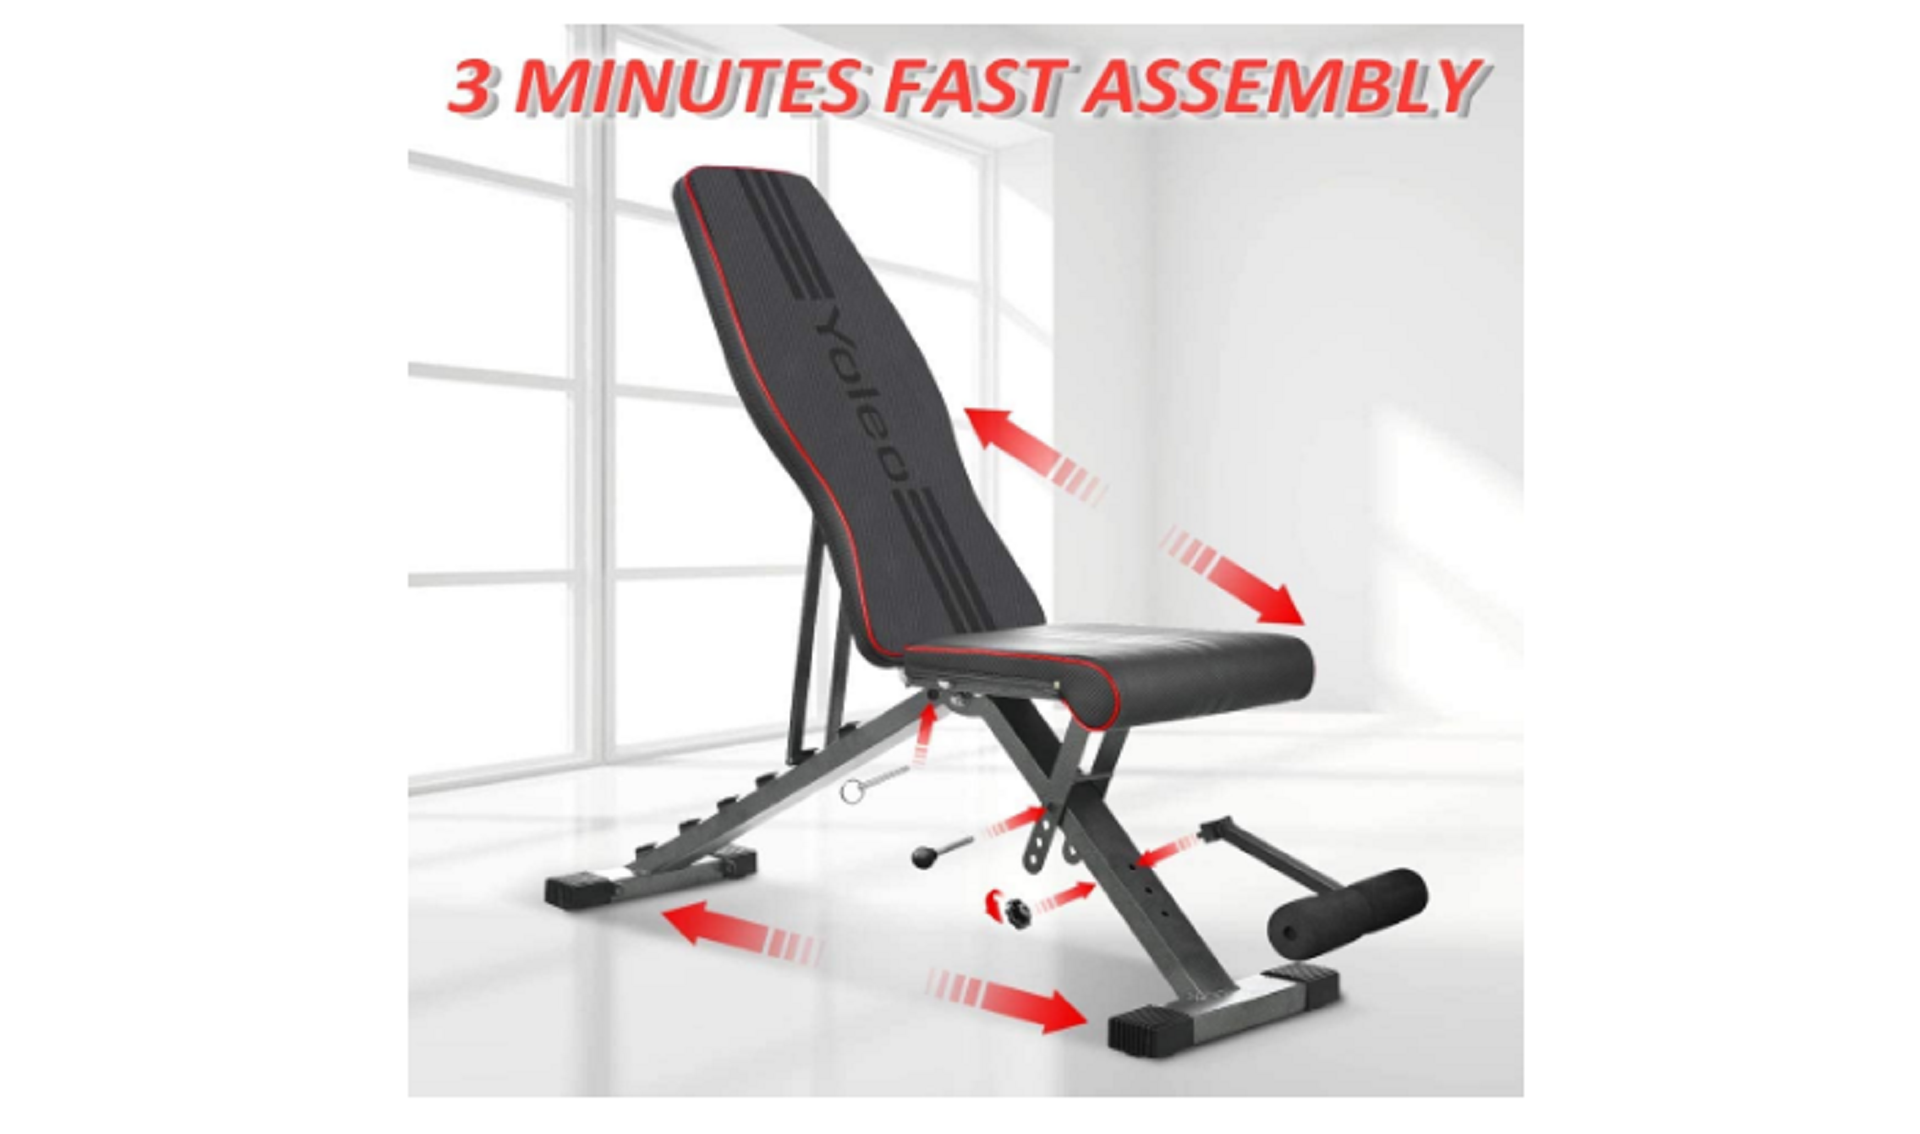 yoleo foldable weight bench